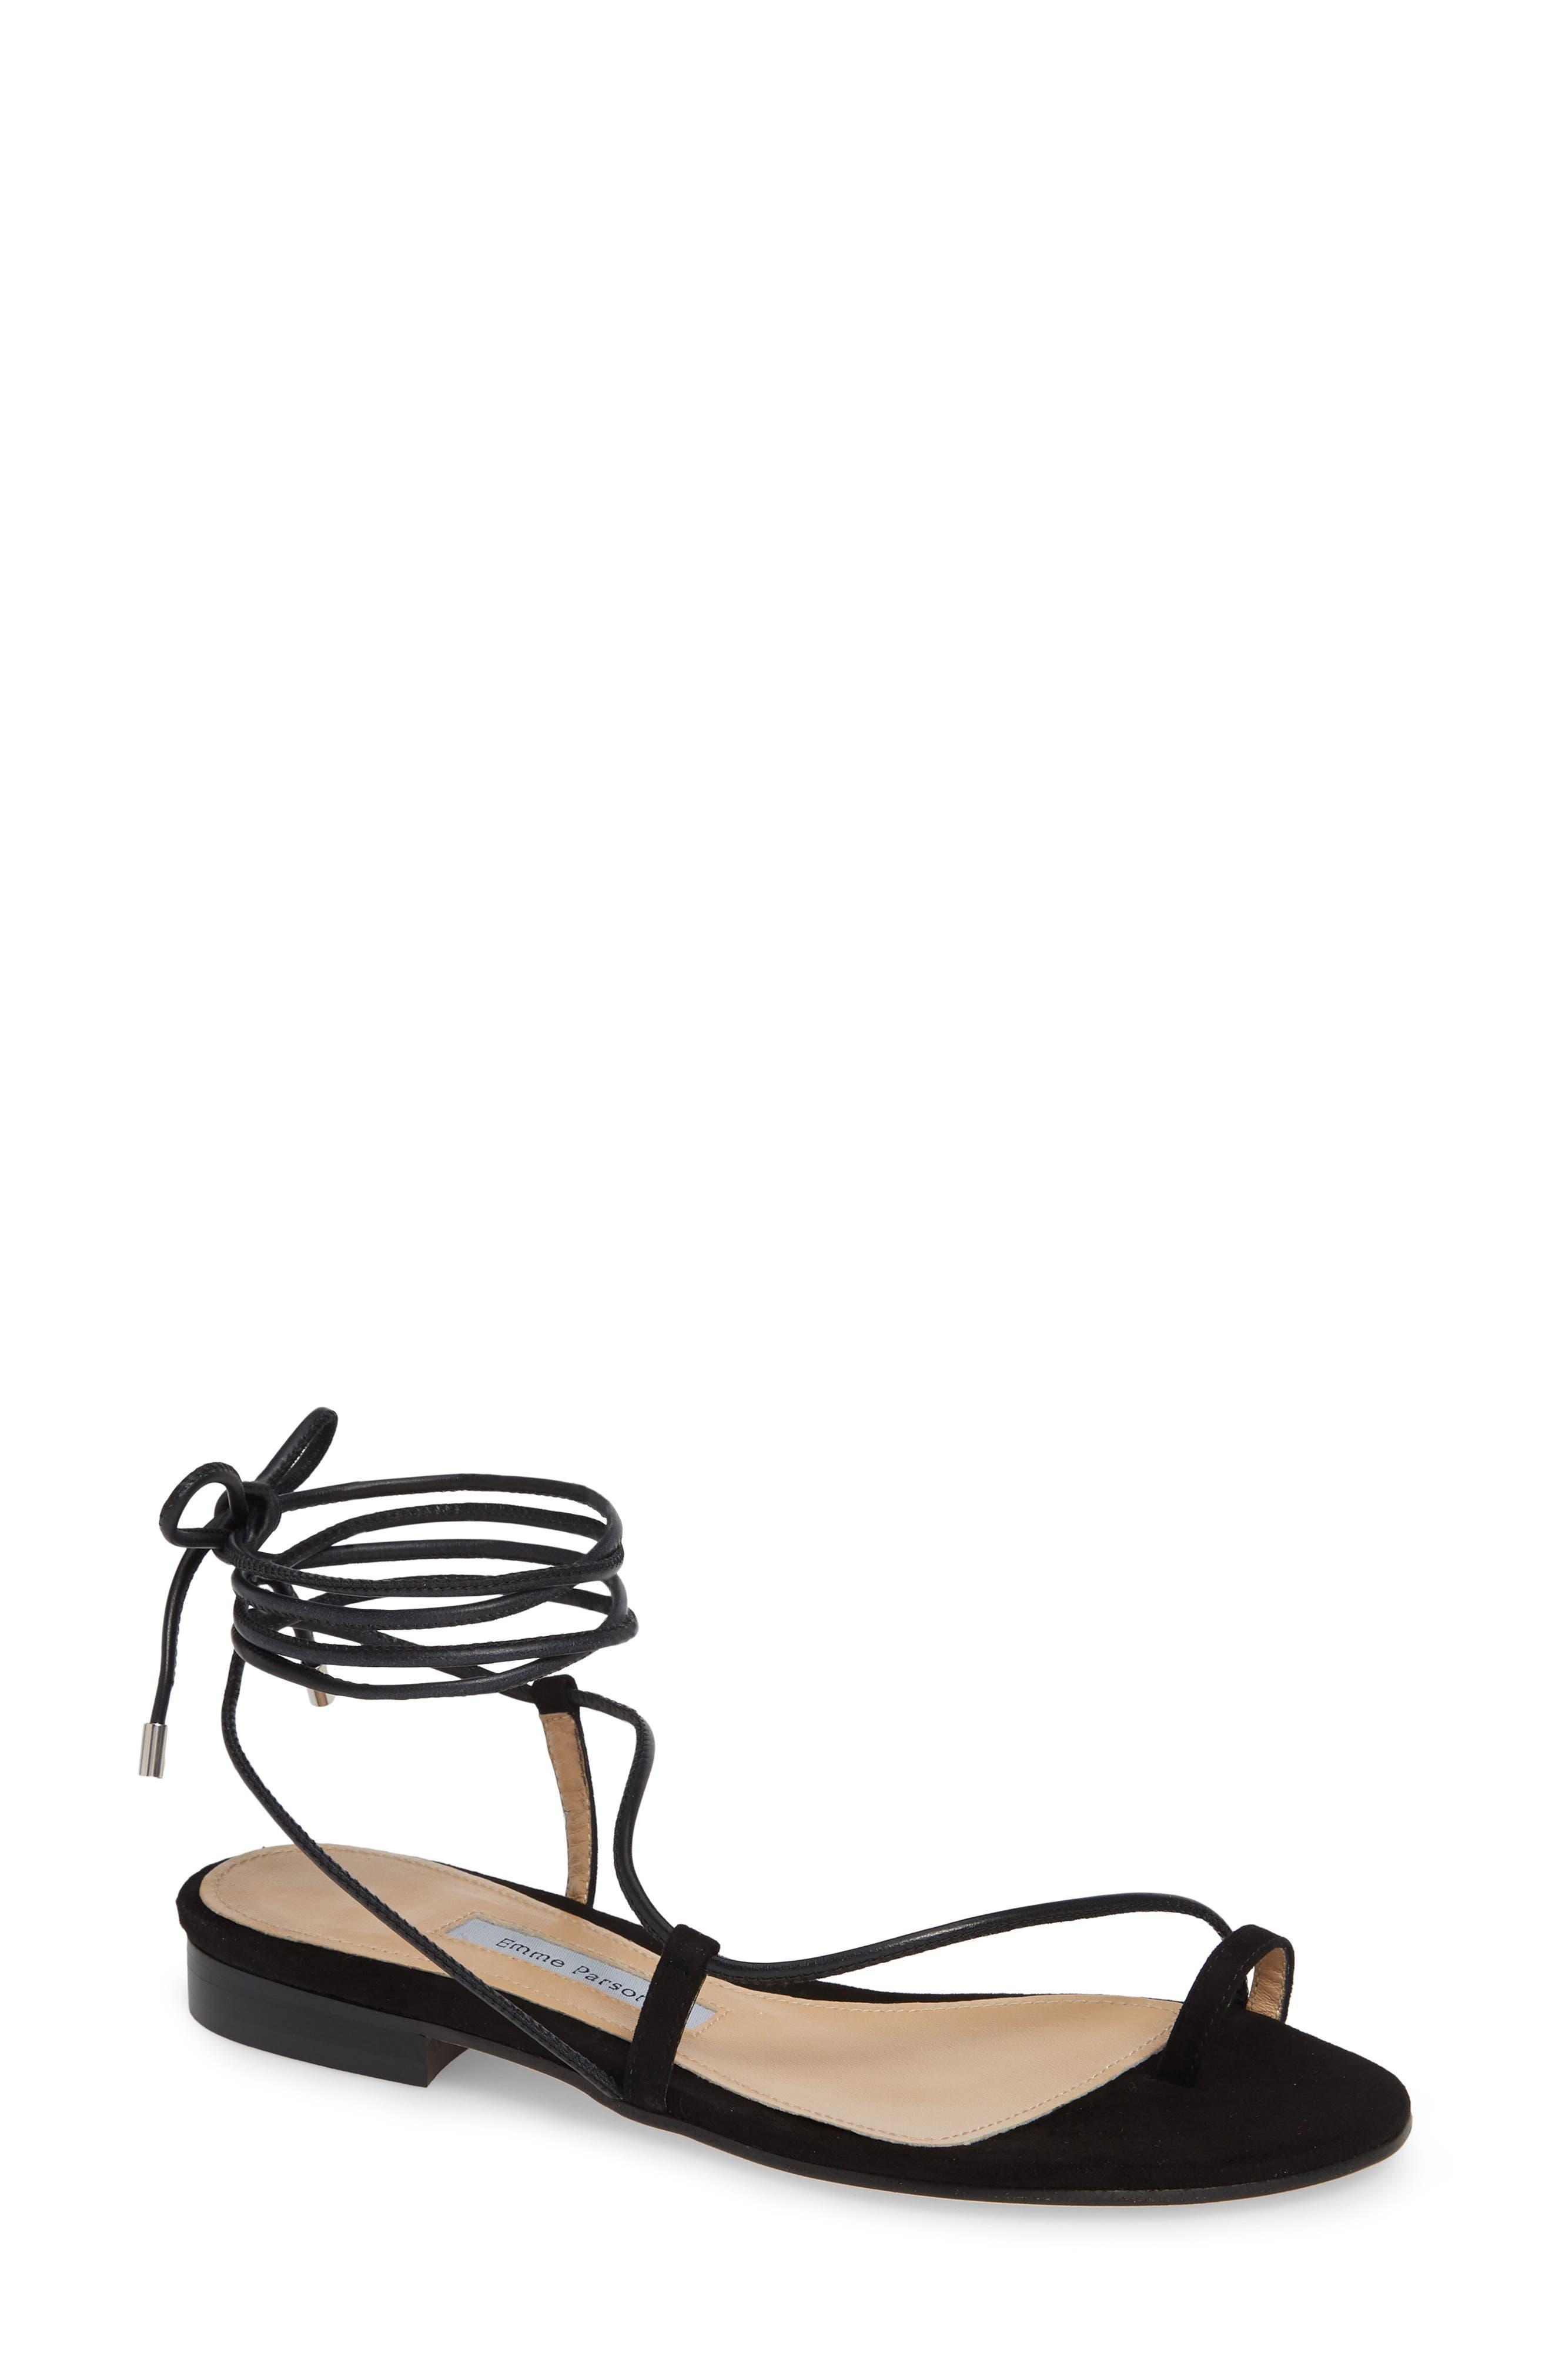 EMME PARSONS Susan Ankle Tie Sandal in Black